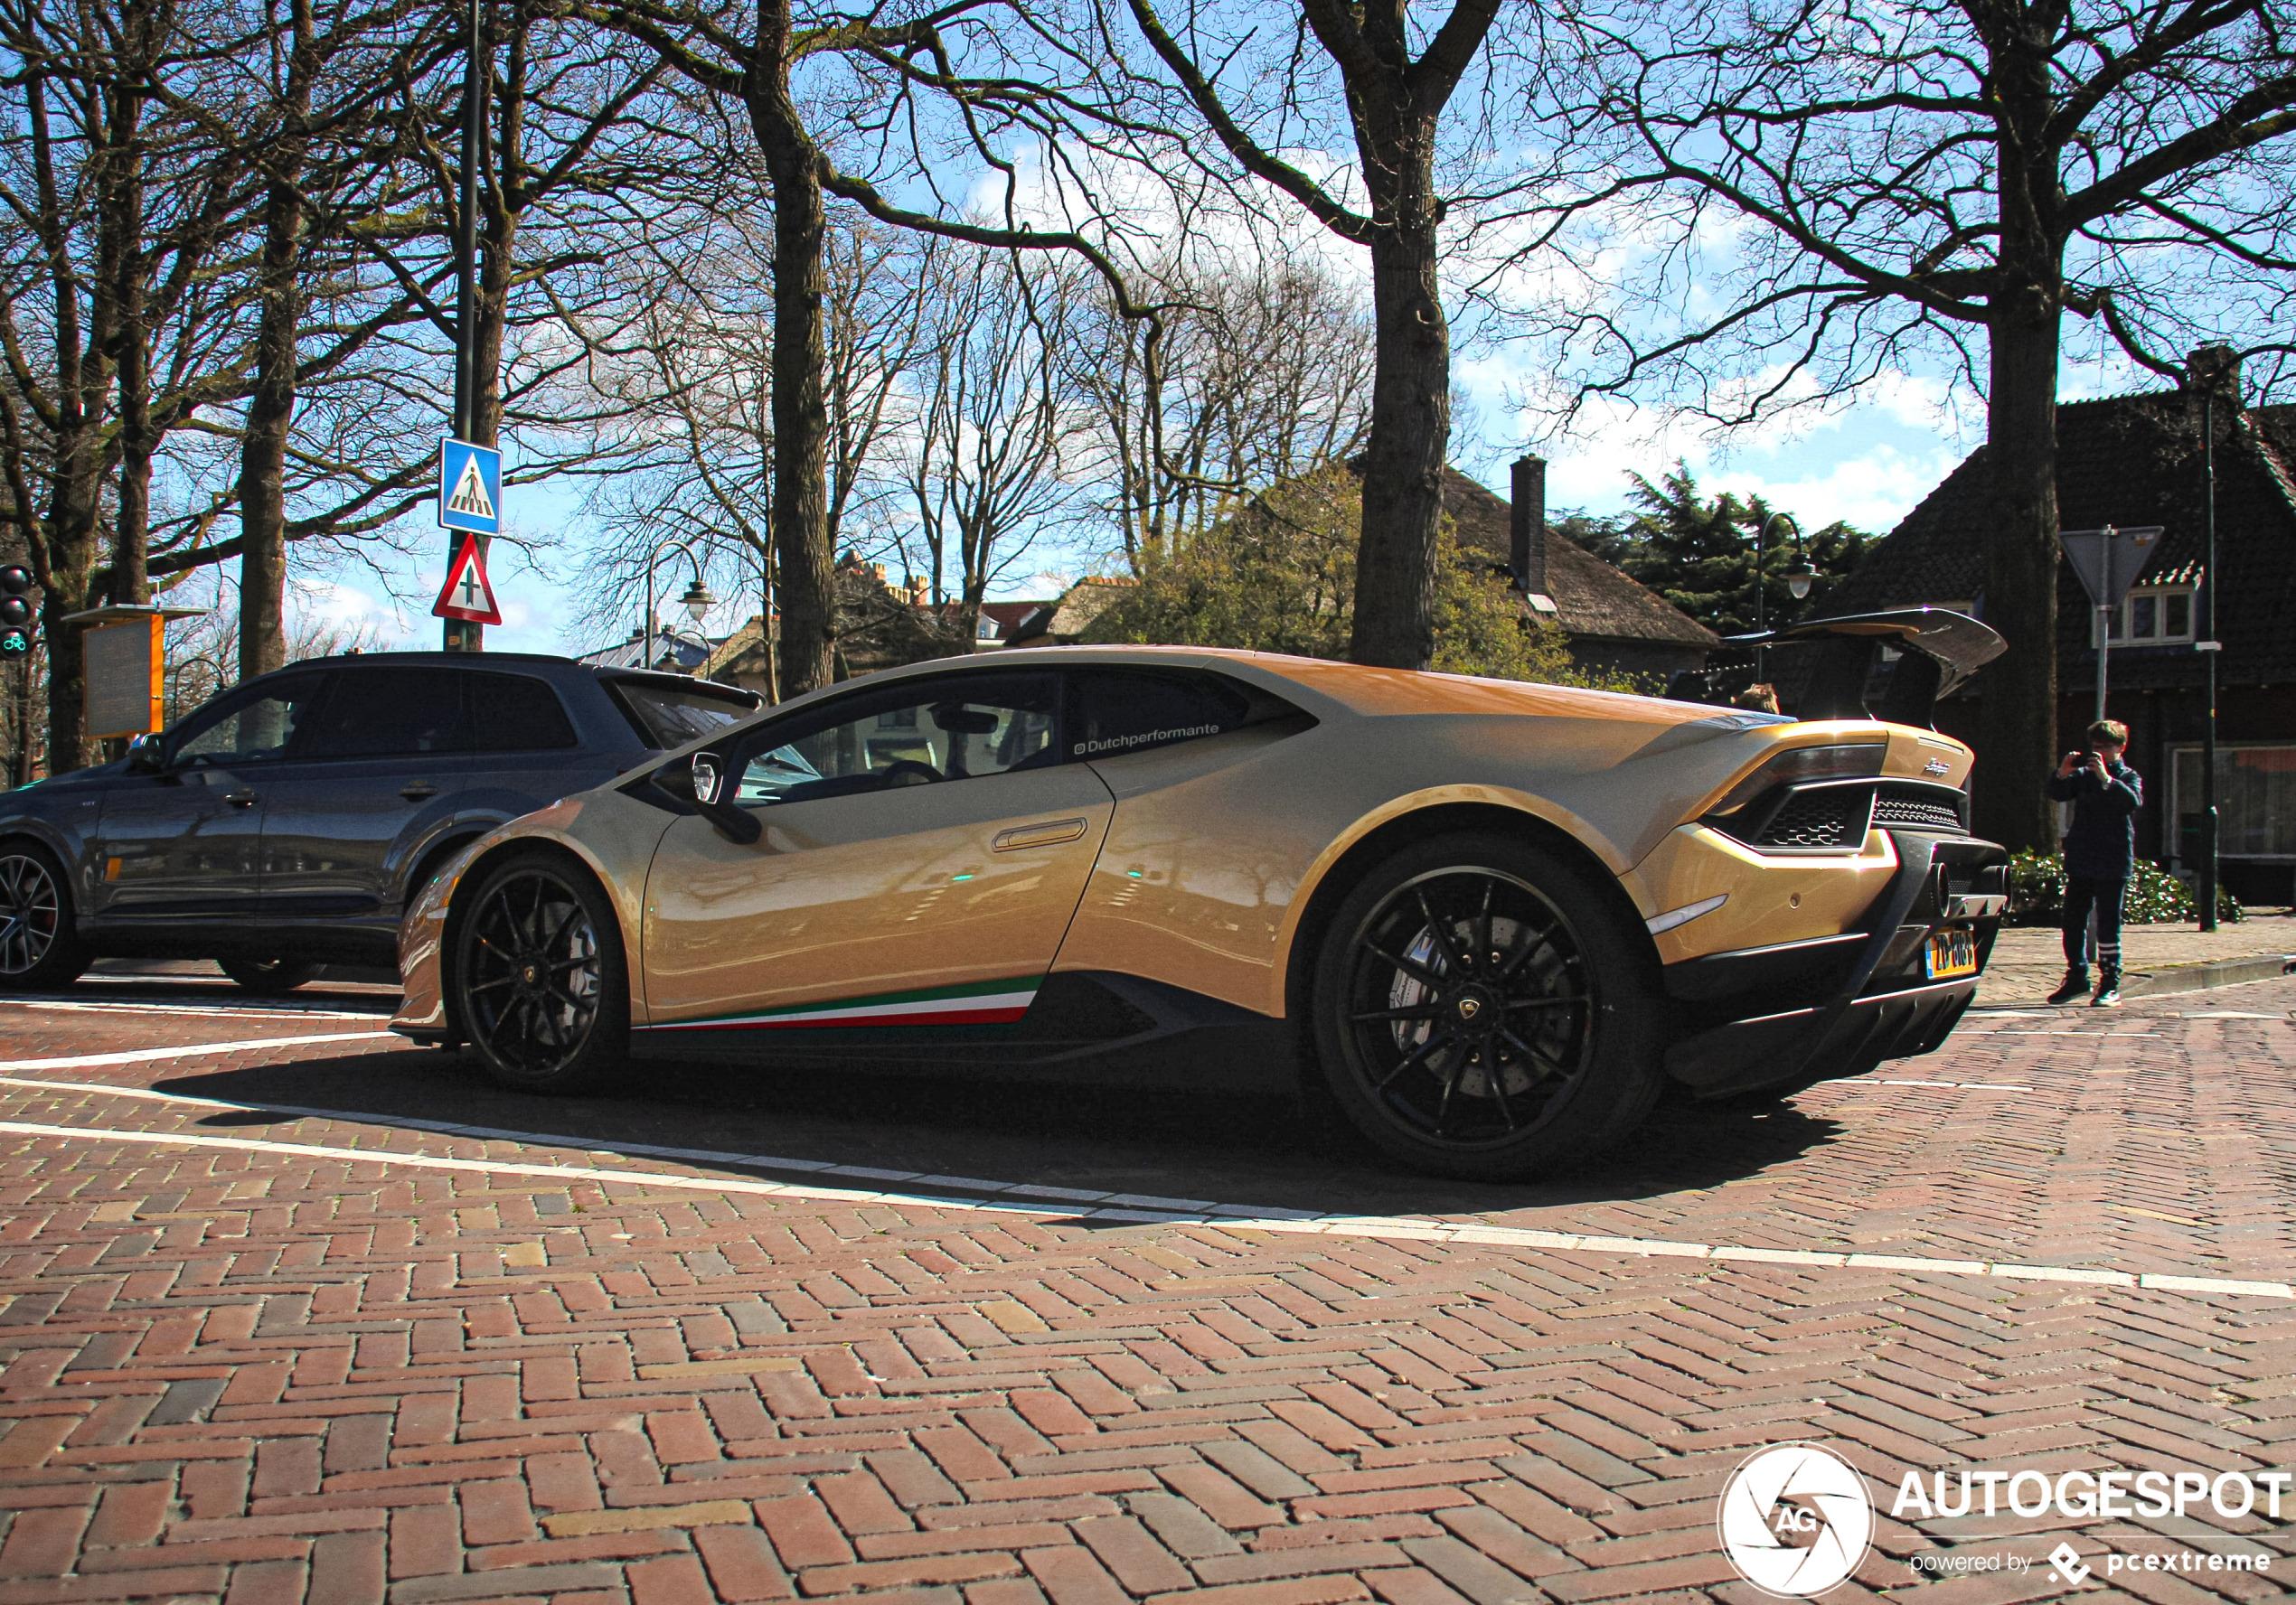 Spot van de dag: Lamborghini Huracán Performante in Laren